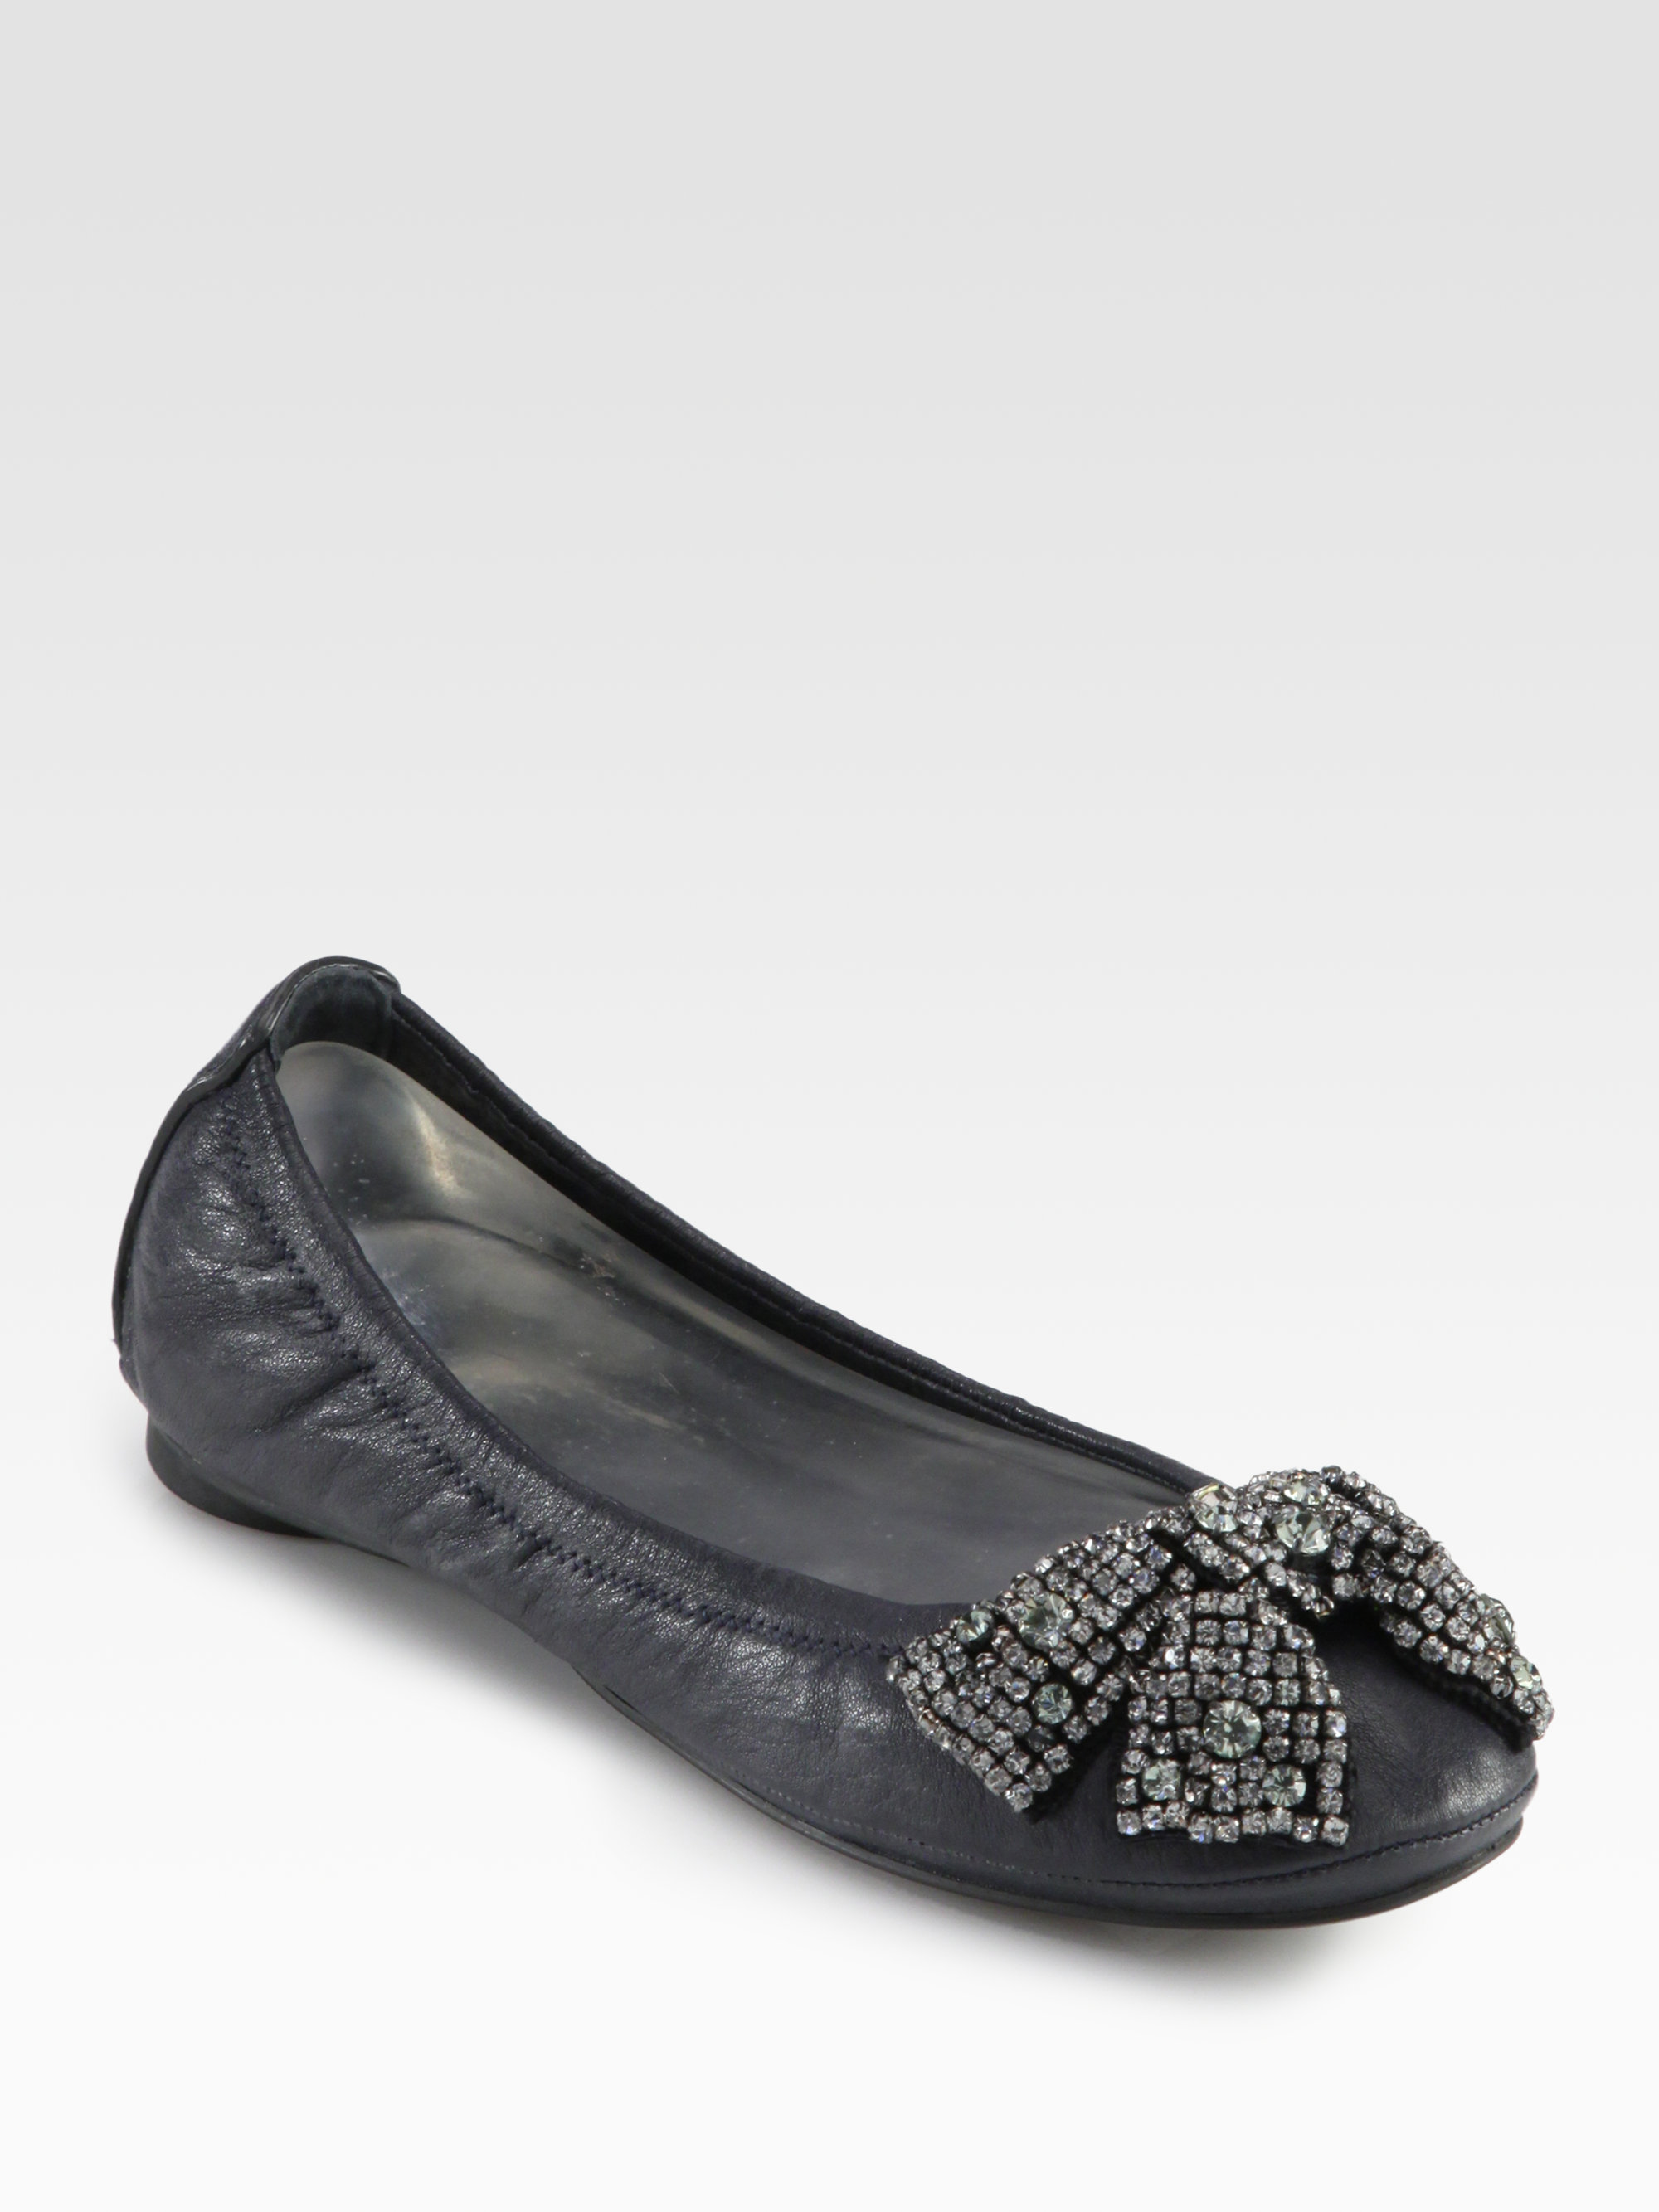 79944adb0277e Lyst - Tory Burch Eddie Leather Crystal Bow Ballet Flats in Brown